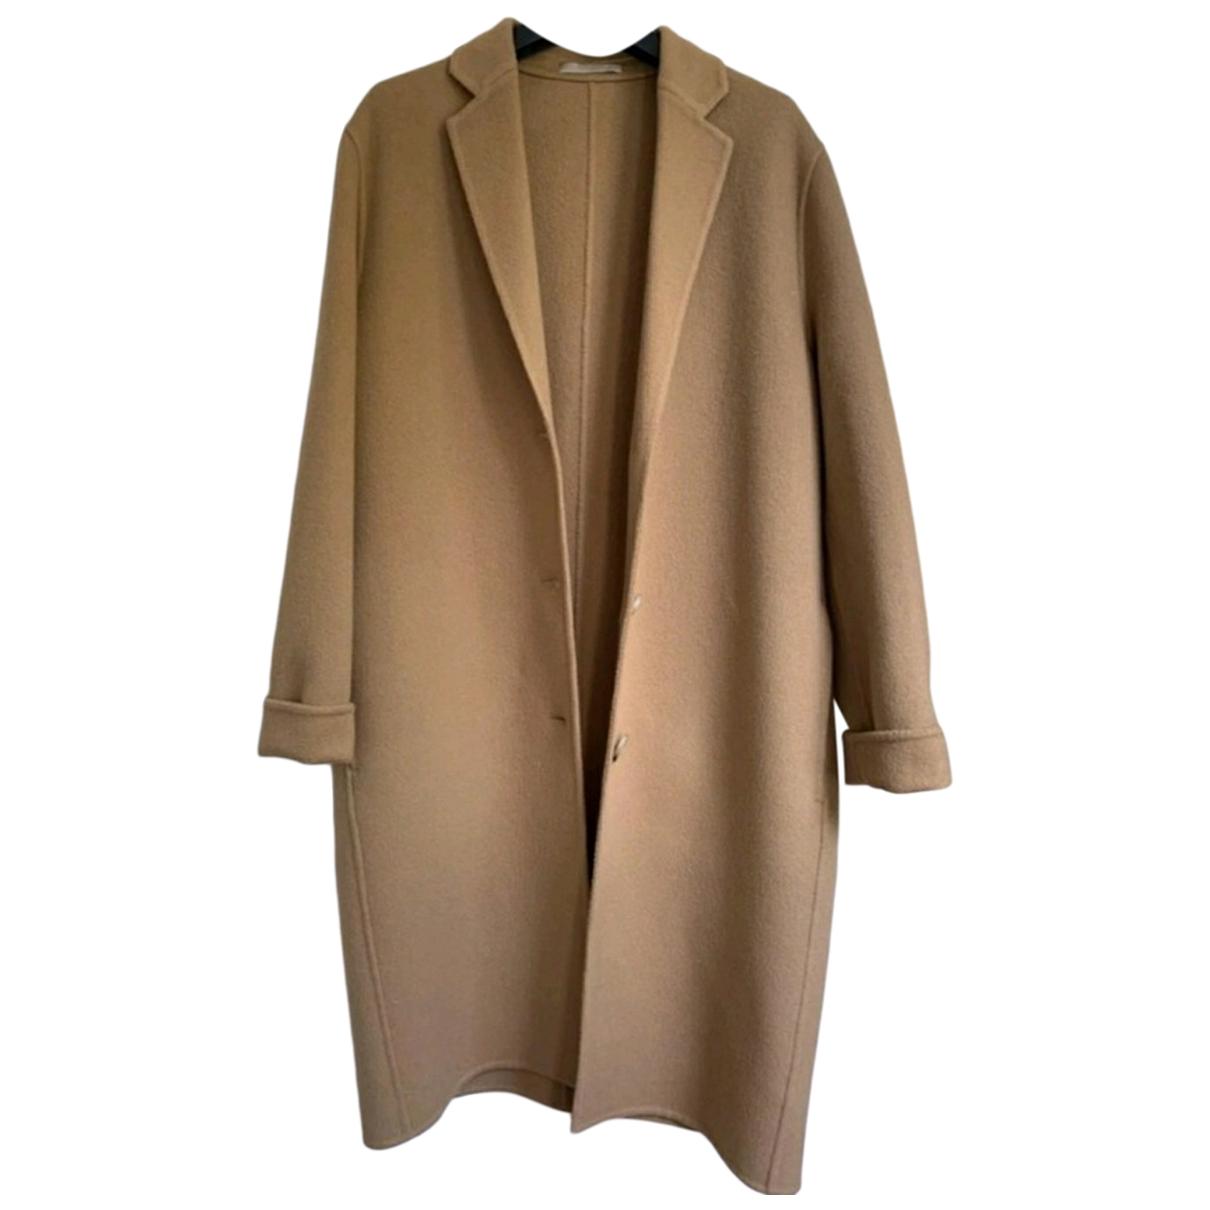 Acne Studios N Camel Wool coat for Women 32 FR